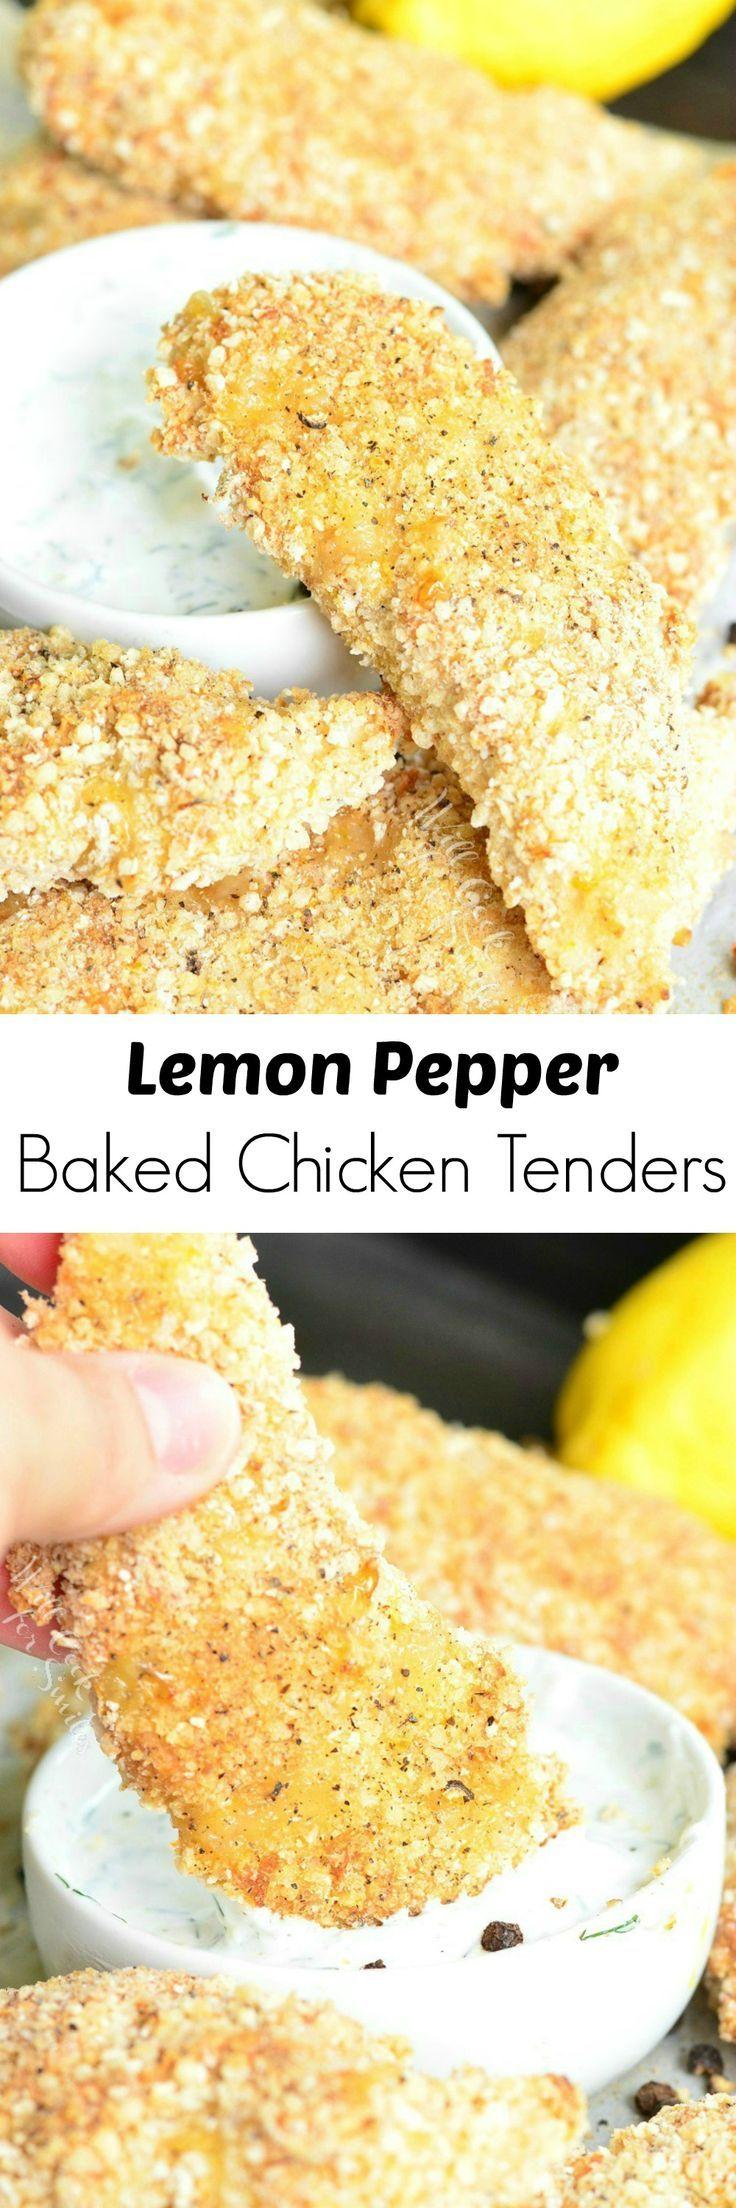 Lemon Pepper Baked Chicken Tenders. (A Gluten Free Recipe.) Juicy, crispy chicken tenders baked in the oven with gluten free bread crumbs and lemon pepper seasoning.